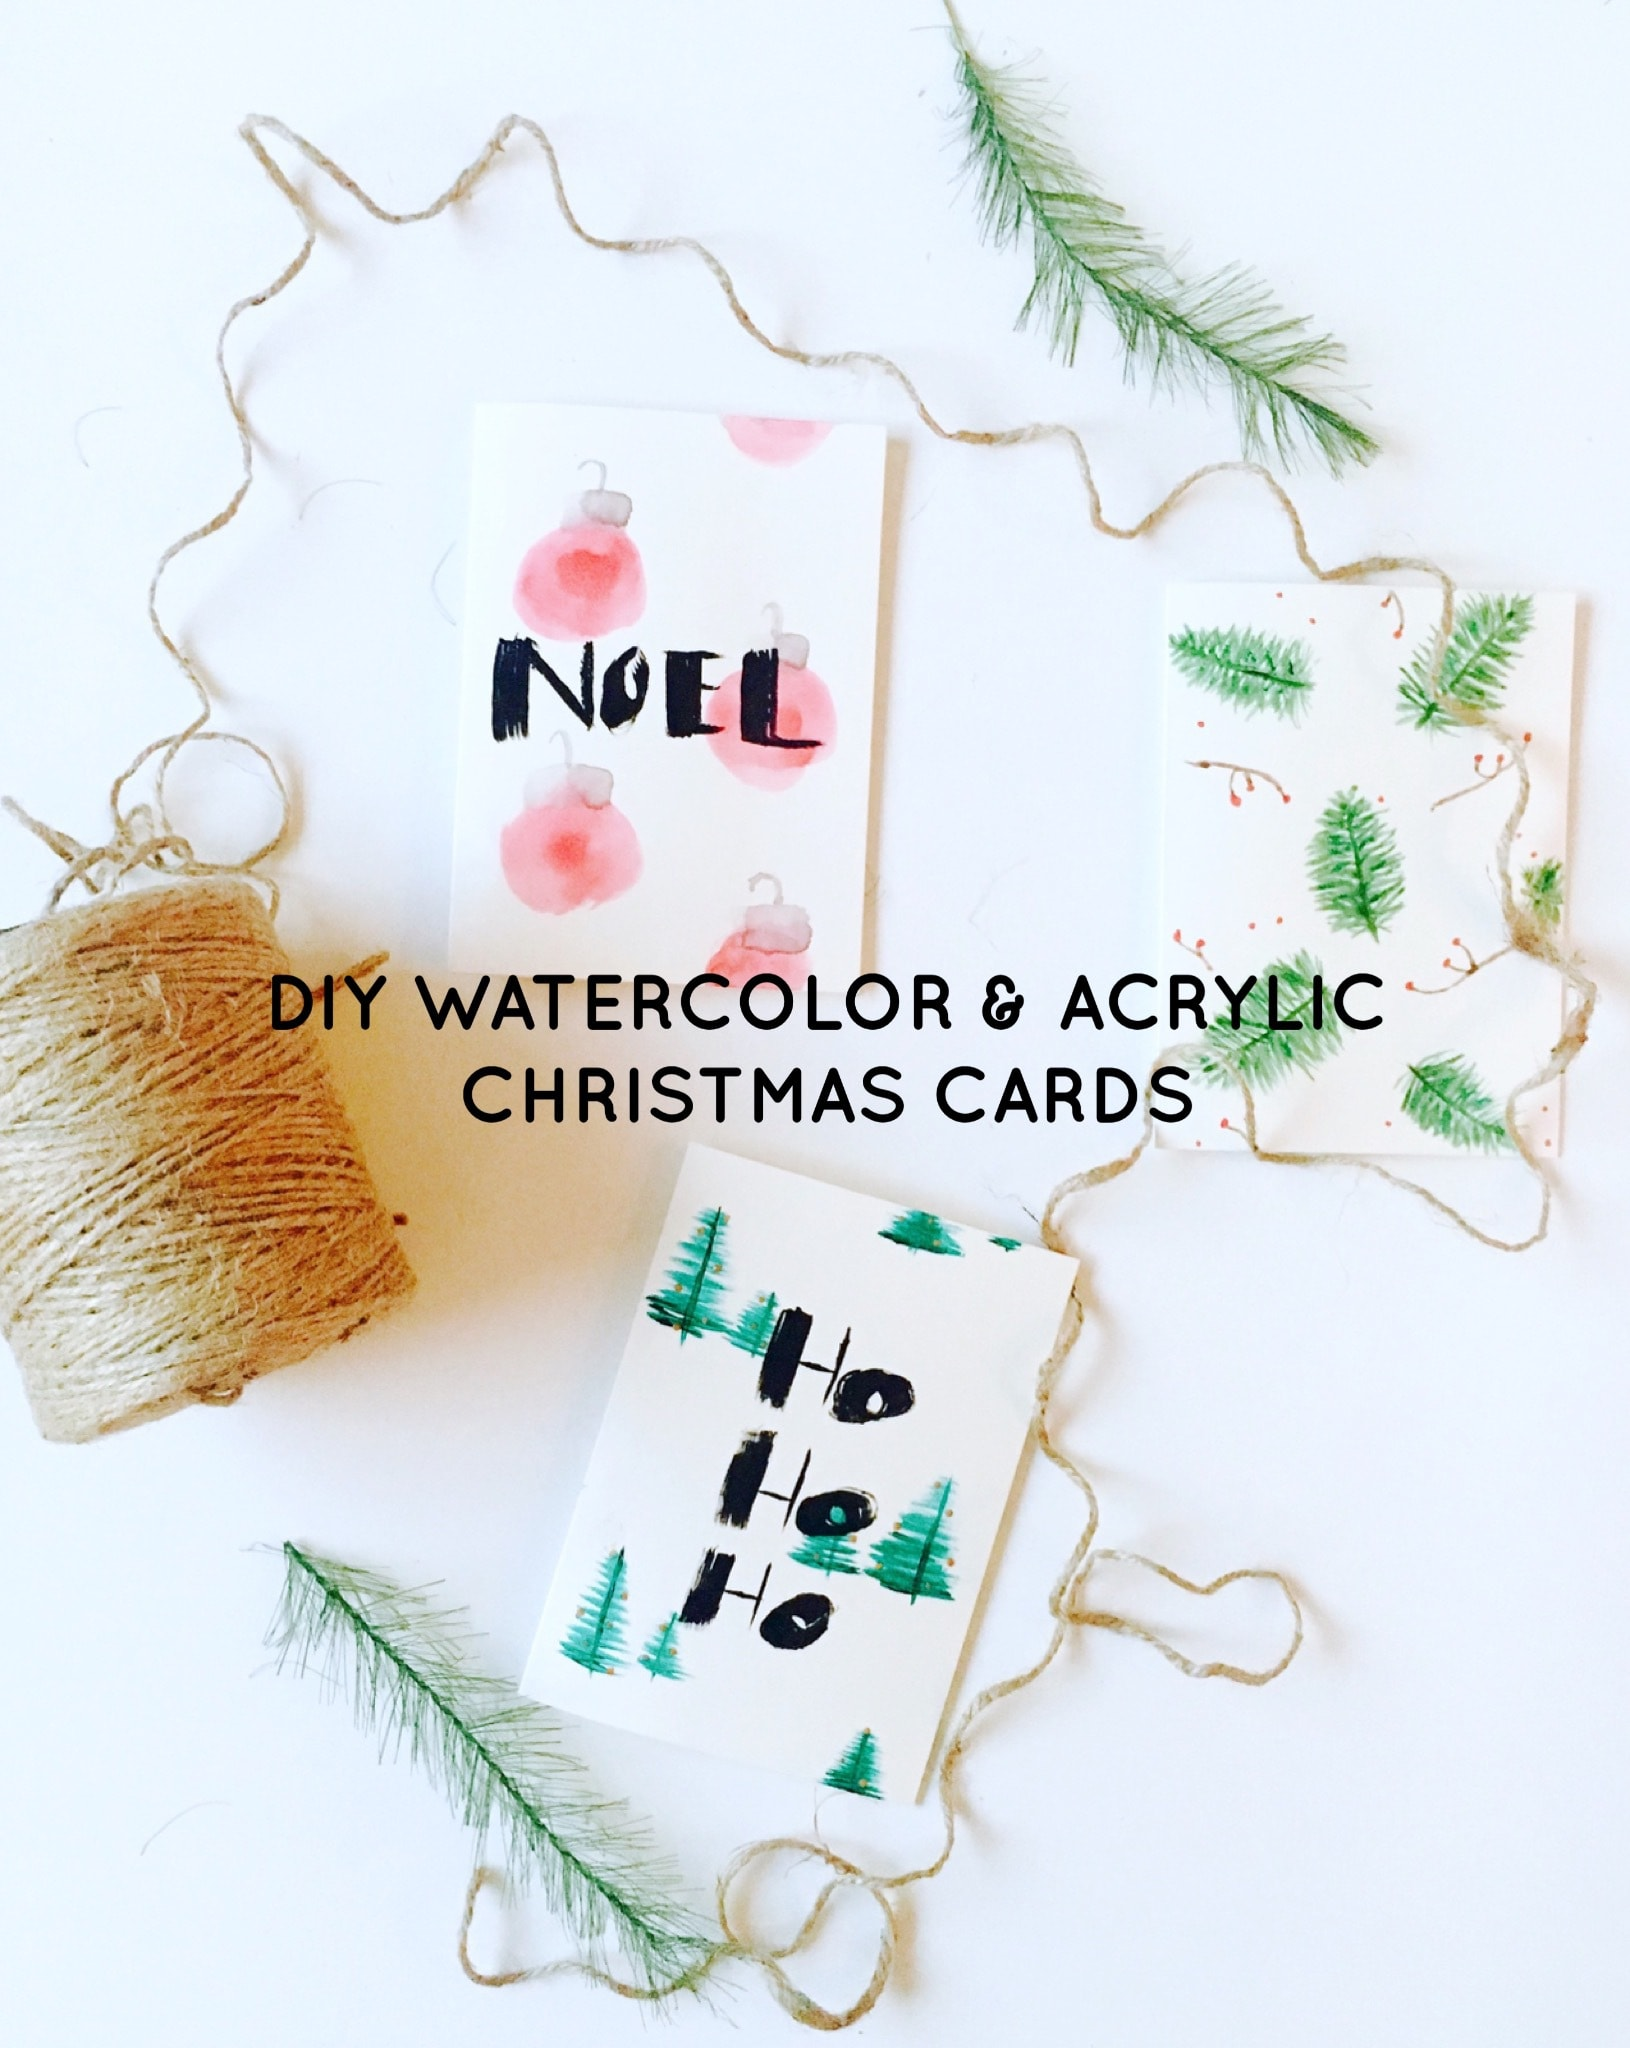 DIY Watercolor & Acrylic Christmas Cards